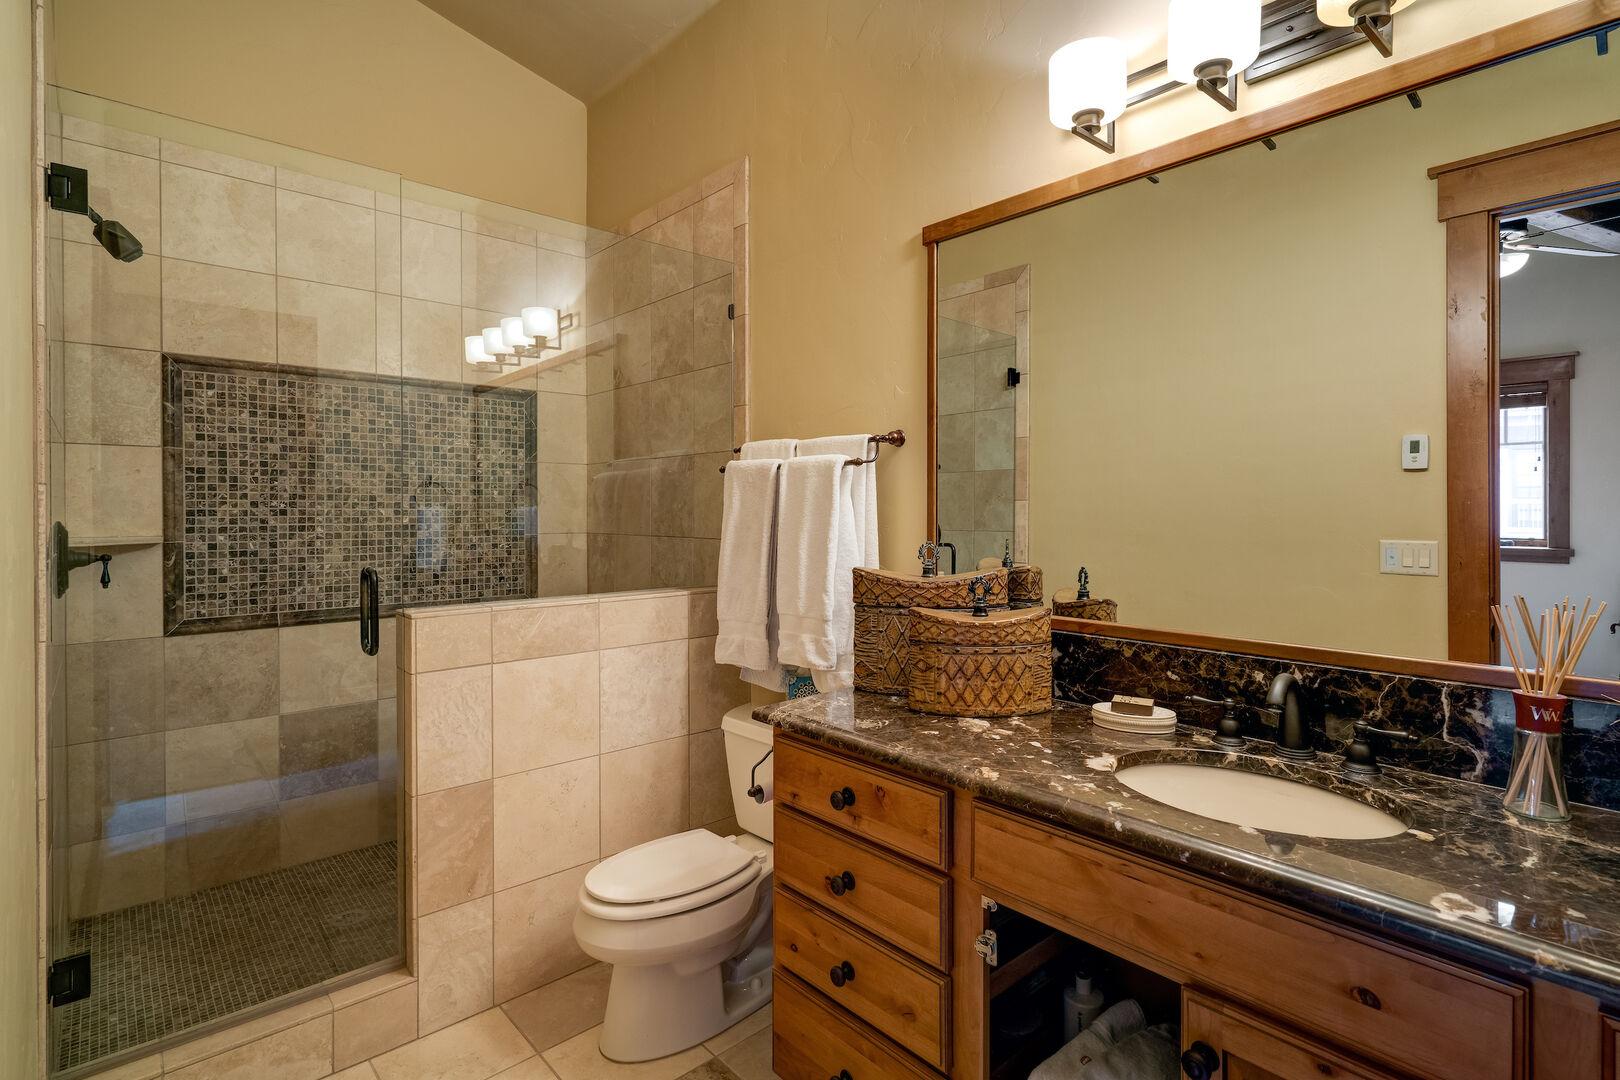 Ensuite bath in the upper bedroom